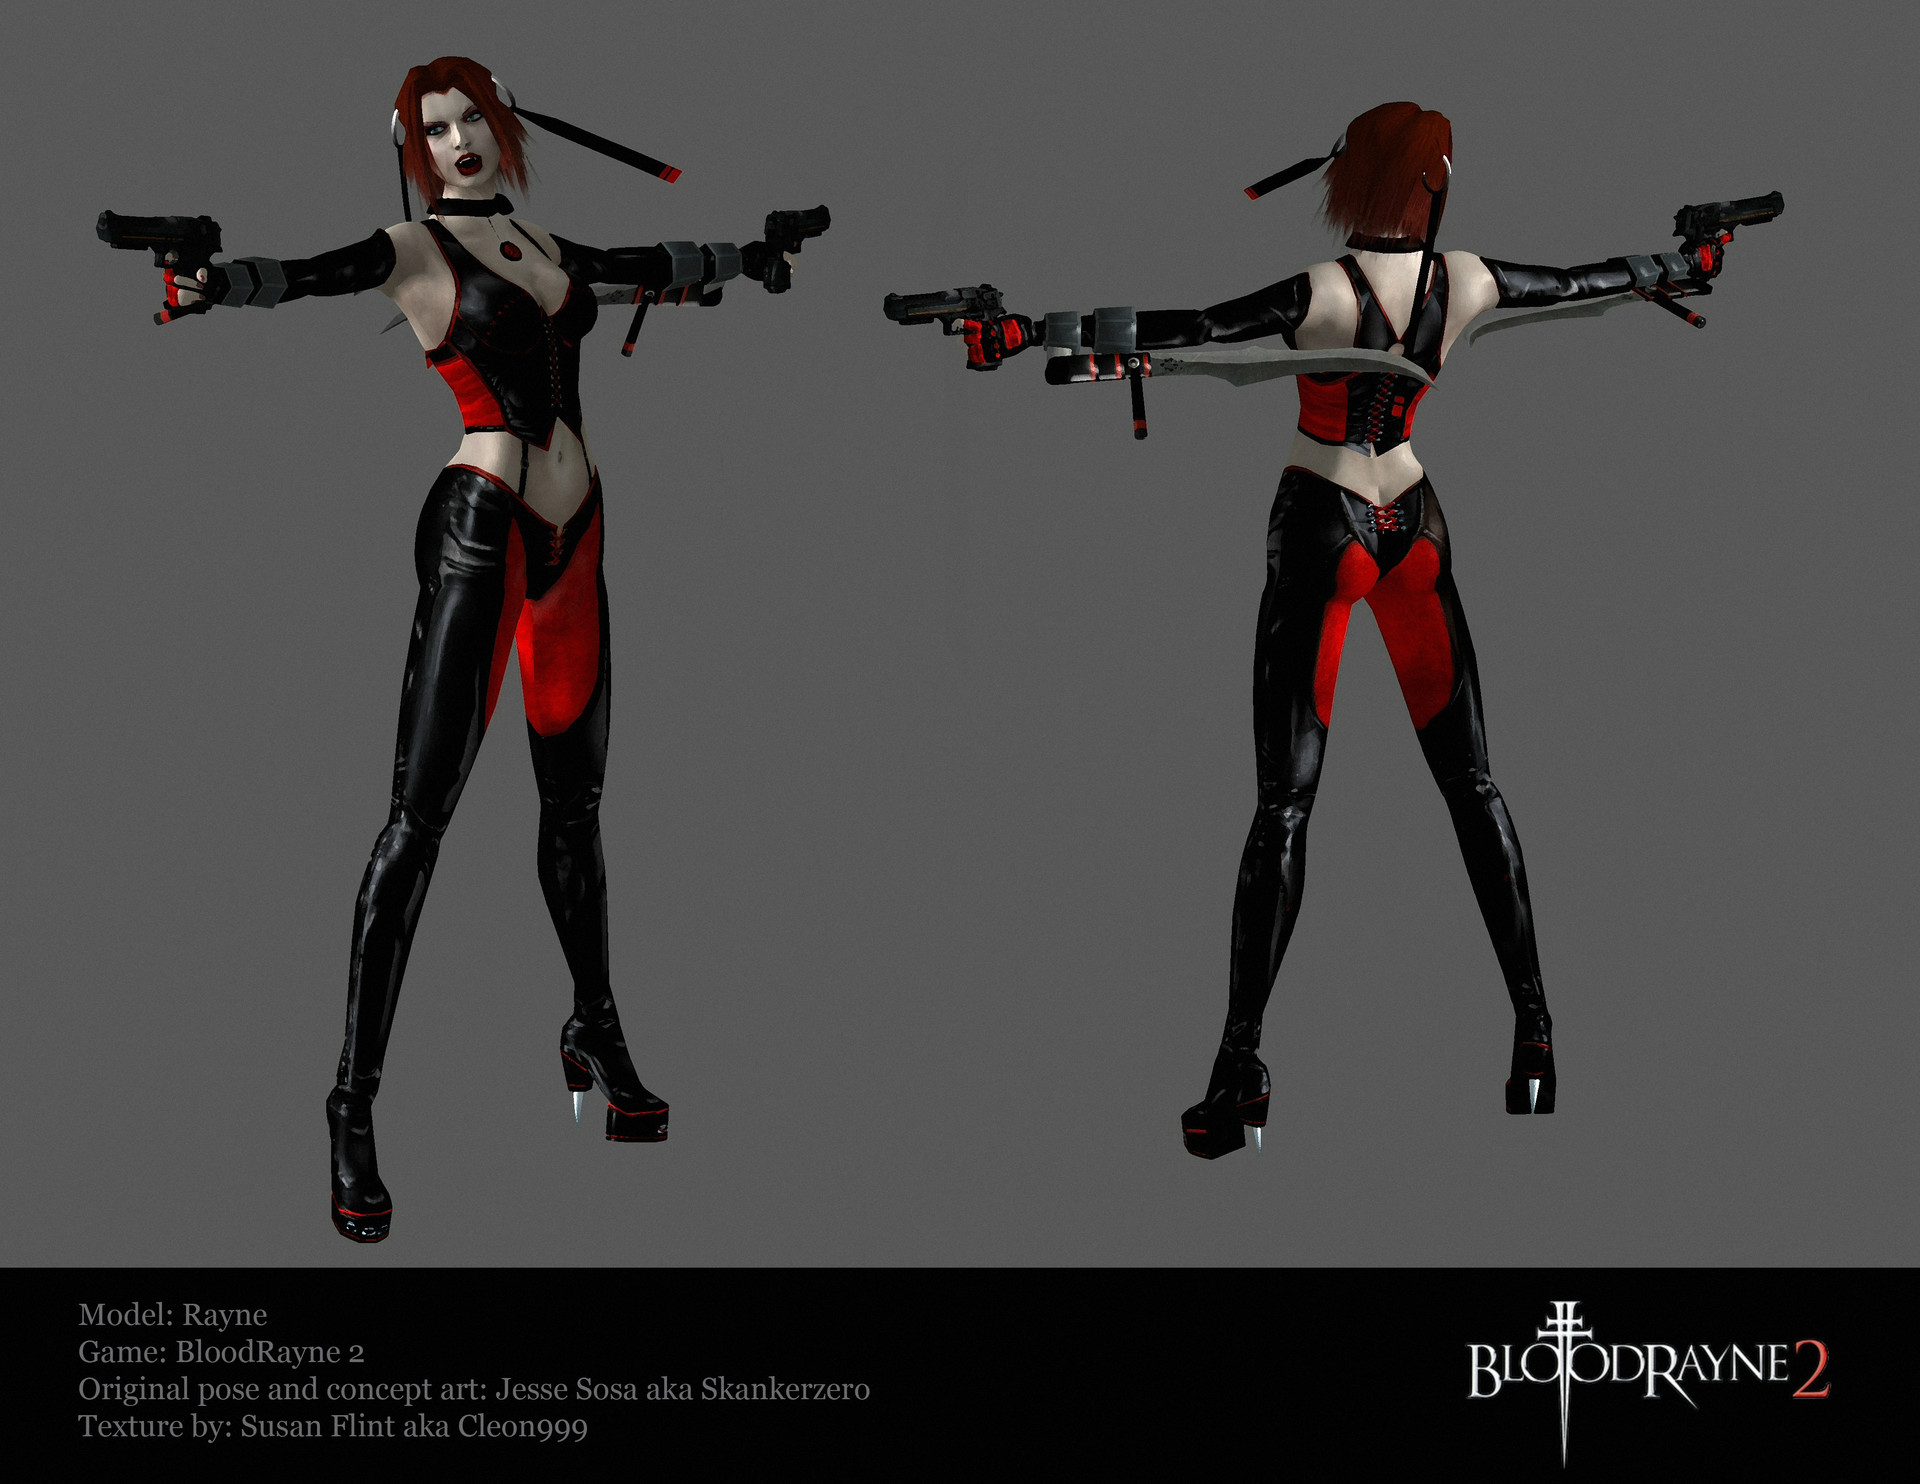 Artstation Bloodrayne 2 New Texture Susan Flint